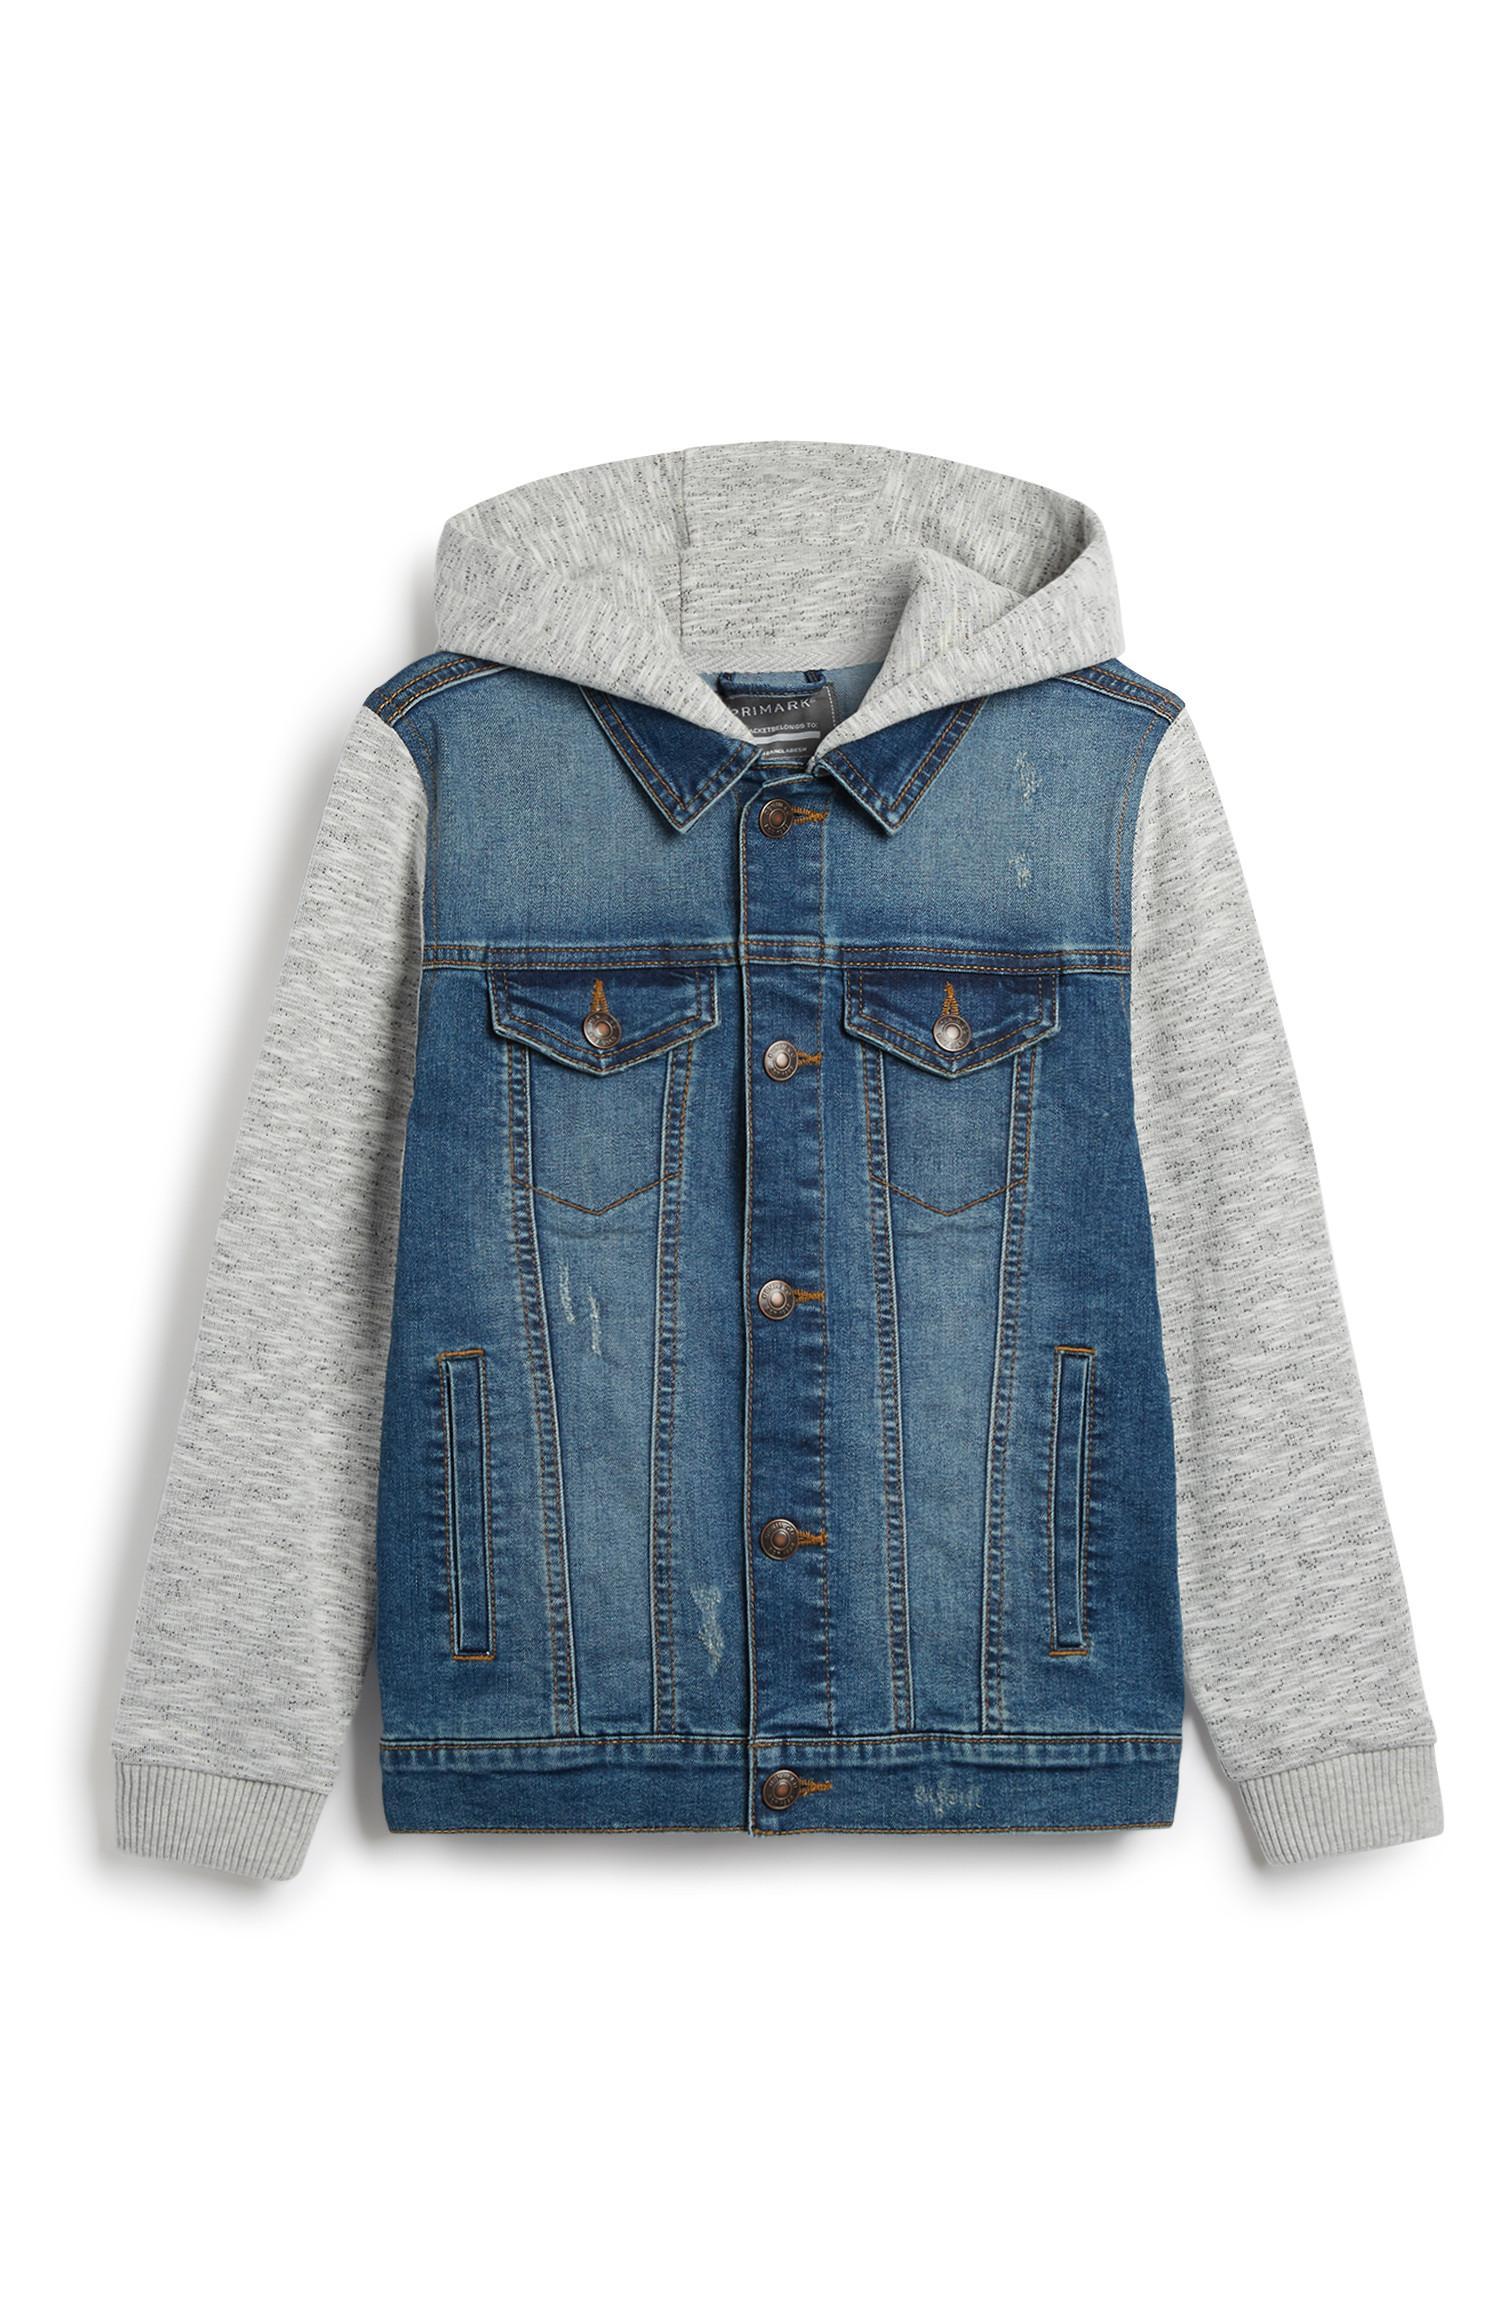 Older Boy Denim Jacket